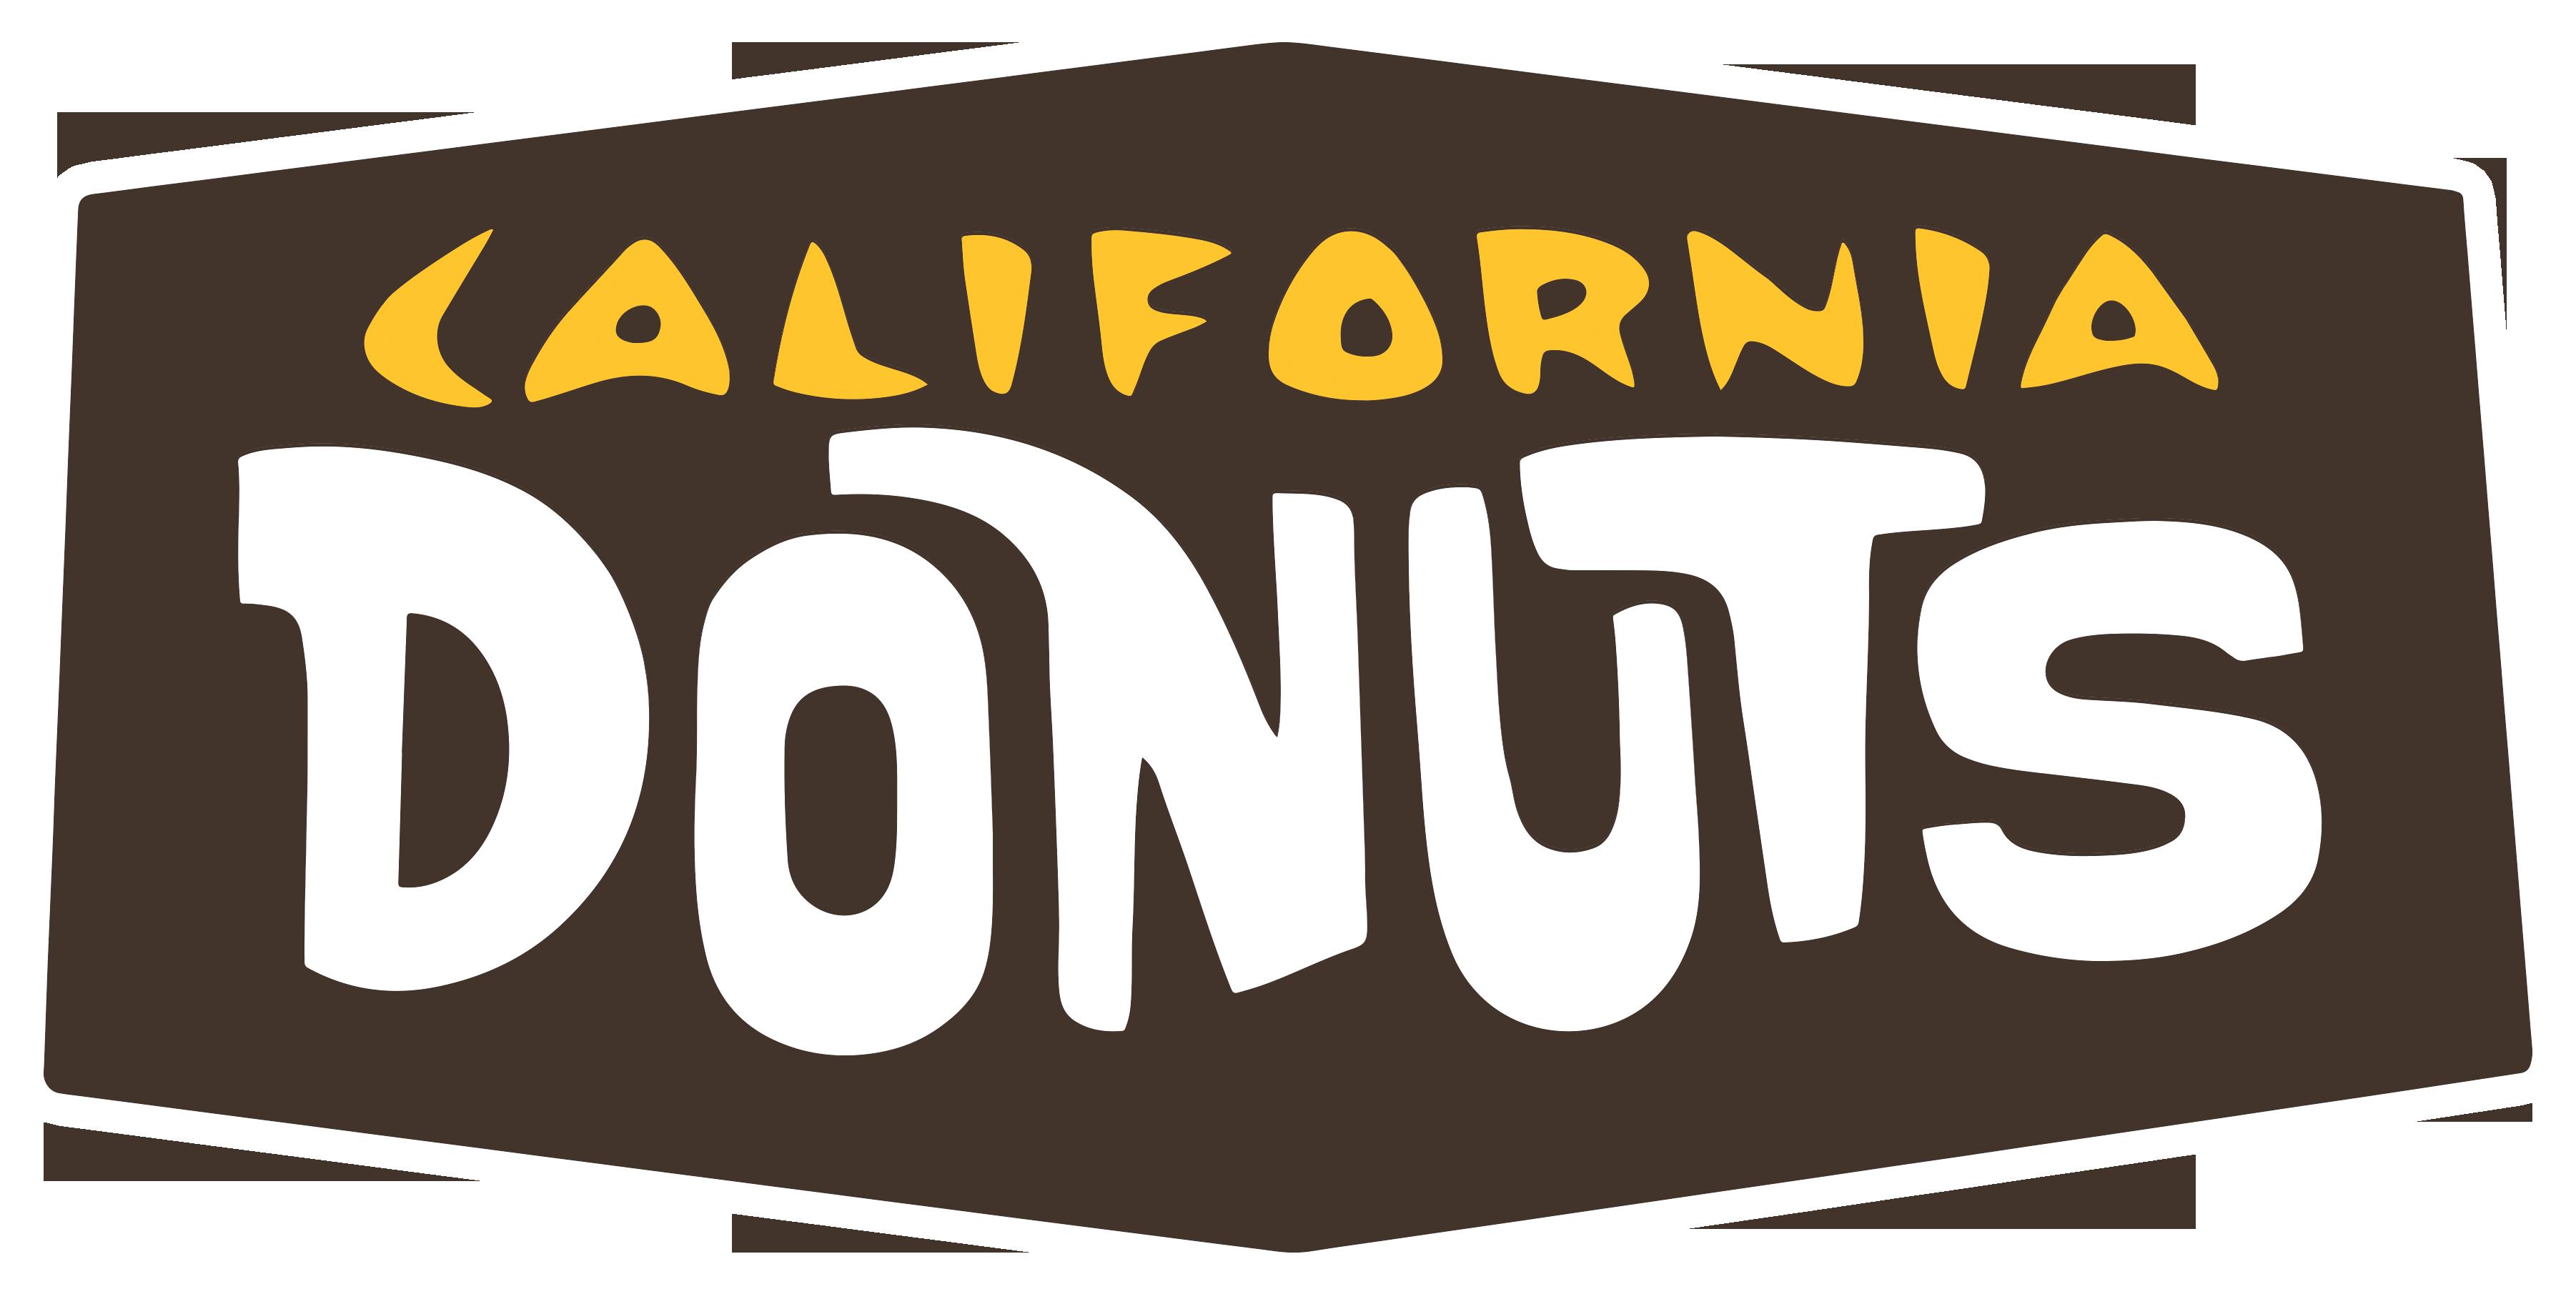 Words clipart doughnut. Letter donuts california